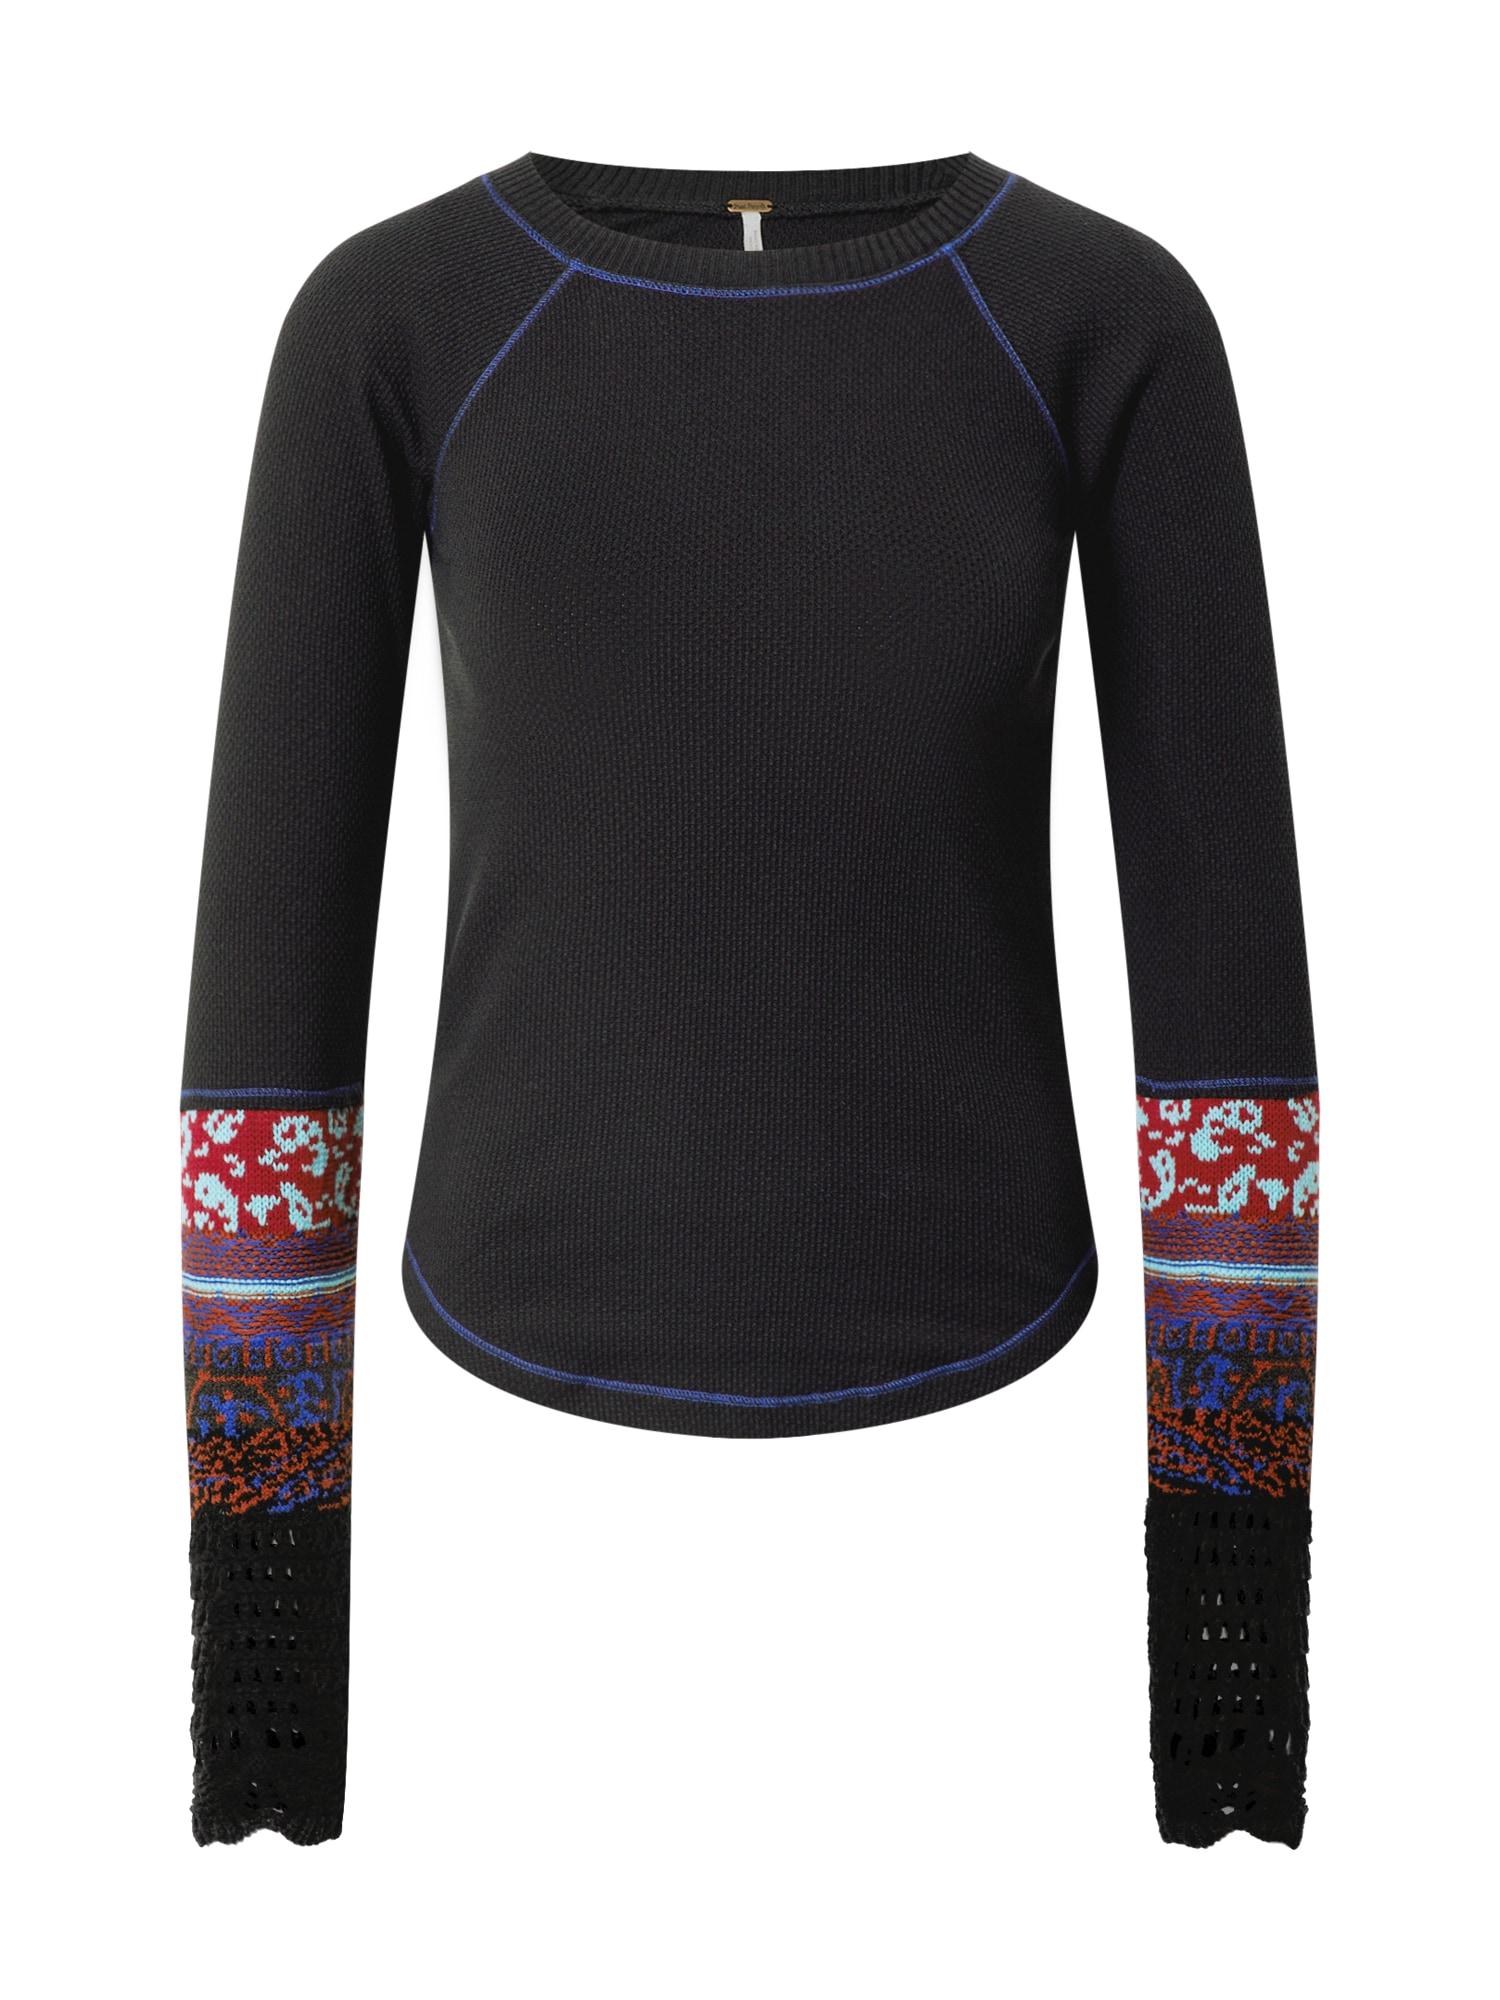 Free People Megztinis juoda